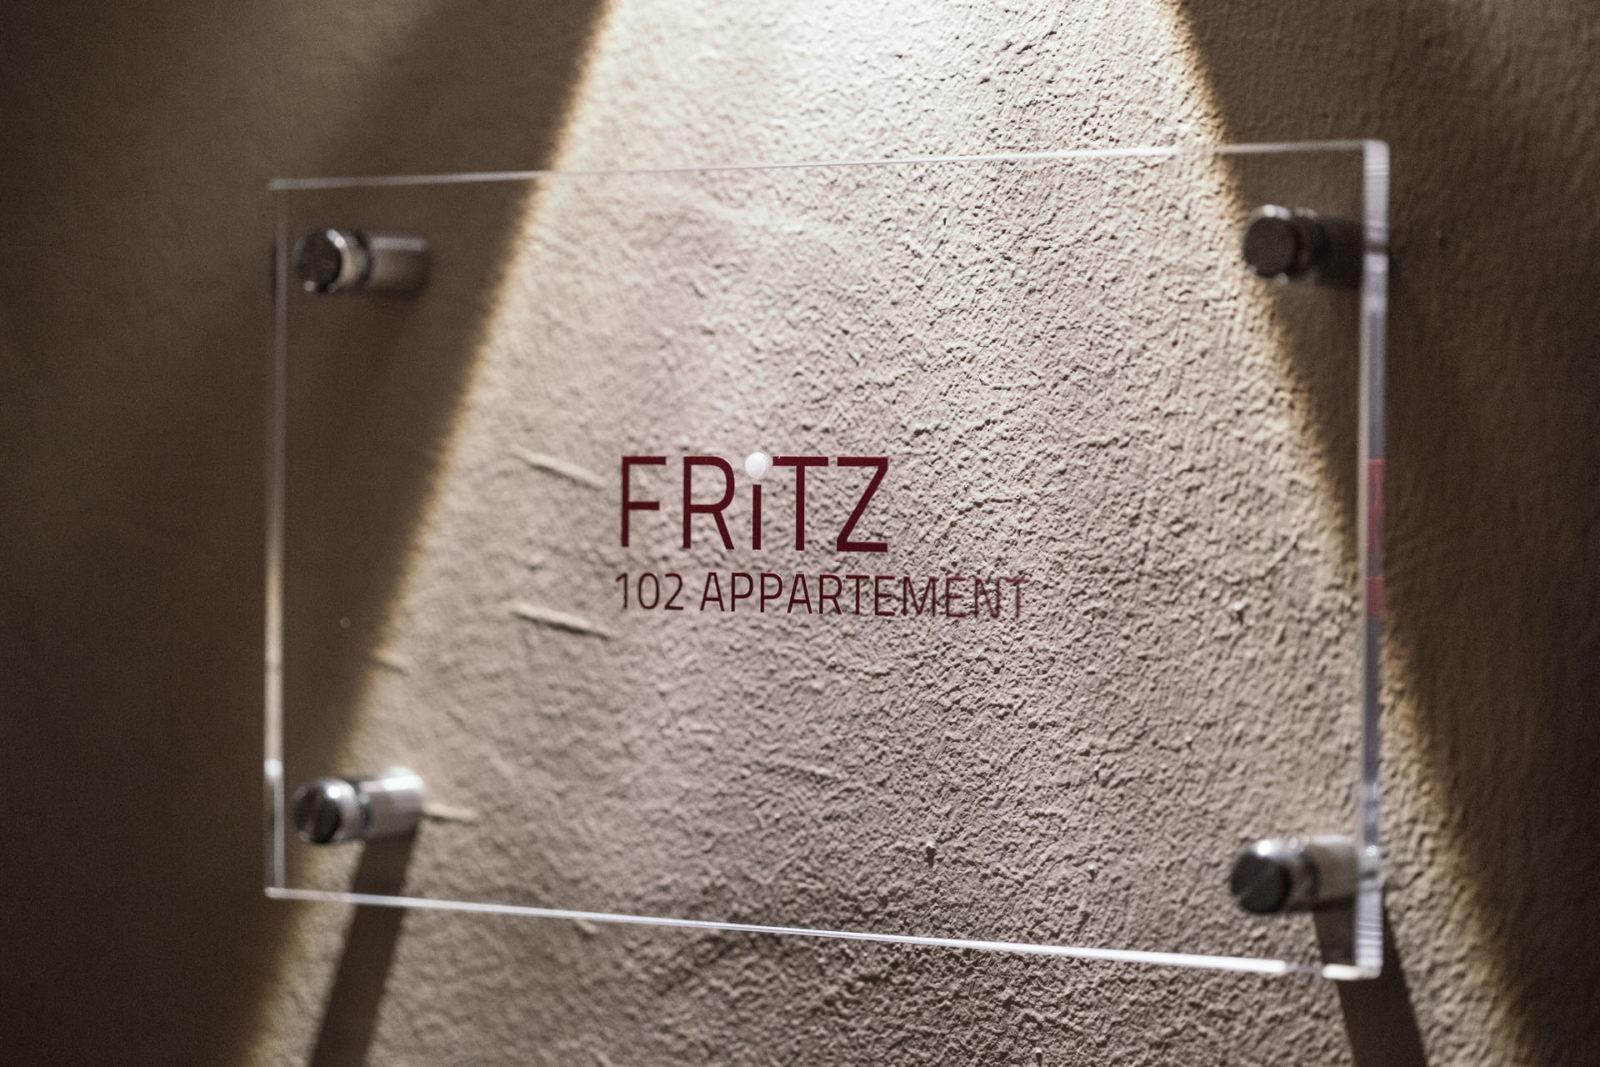 Fritz Appartement